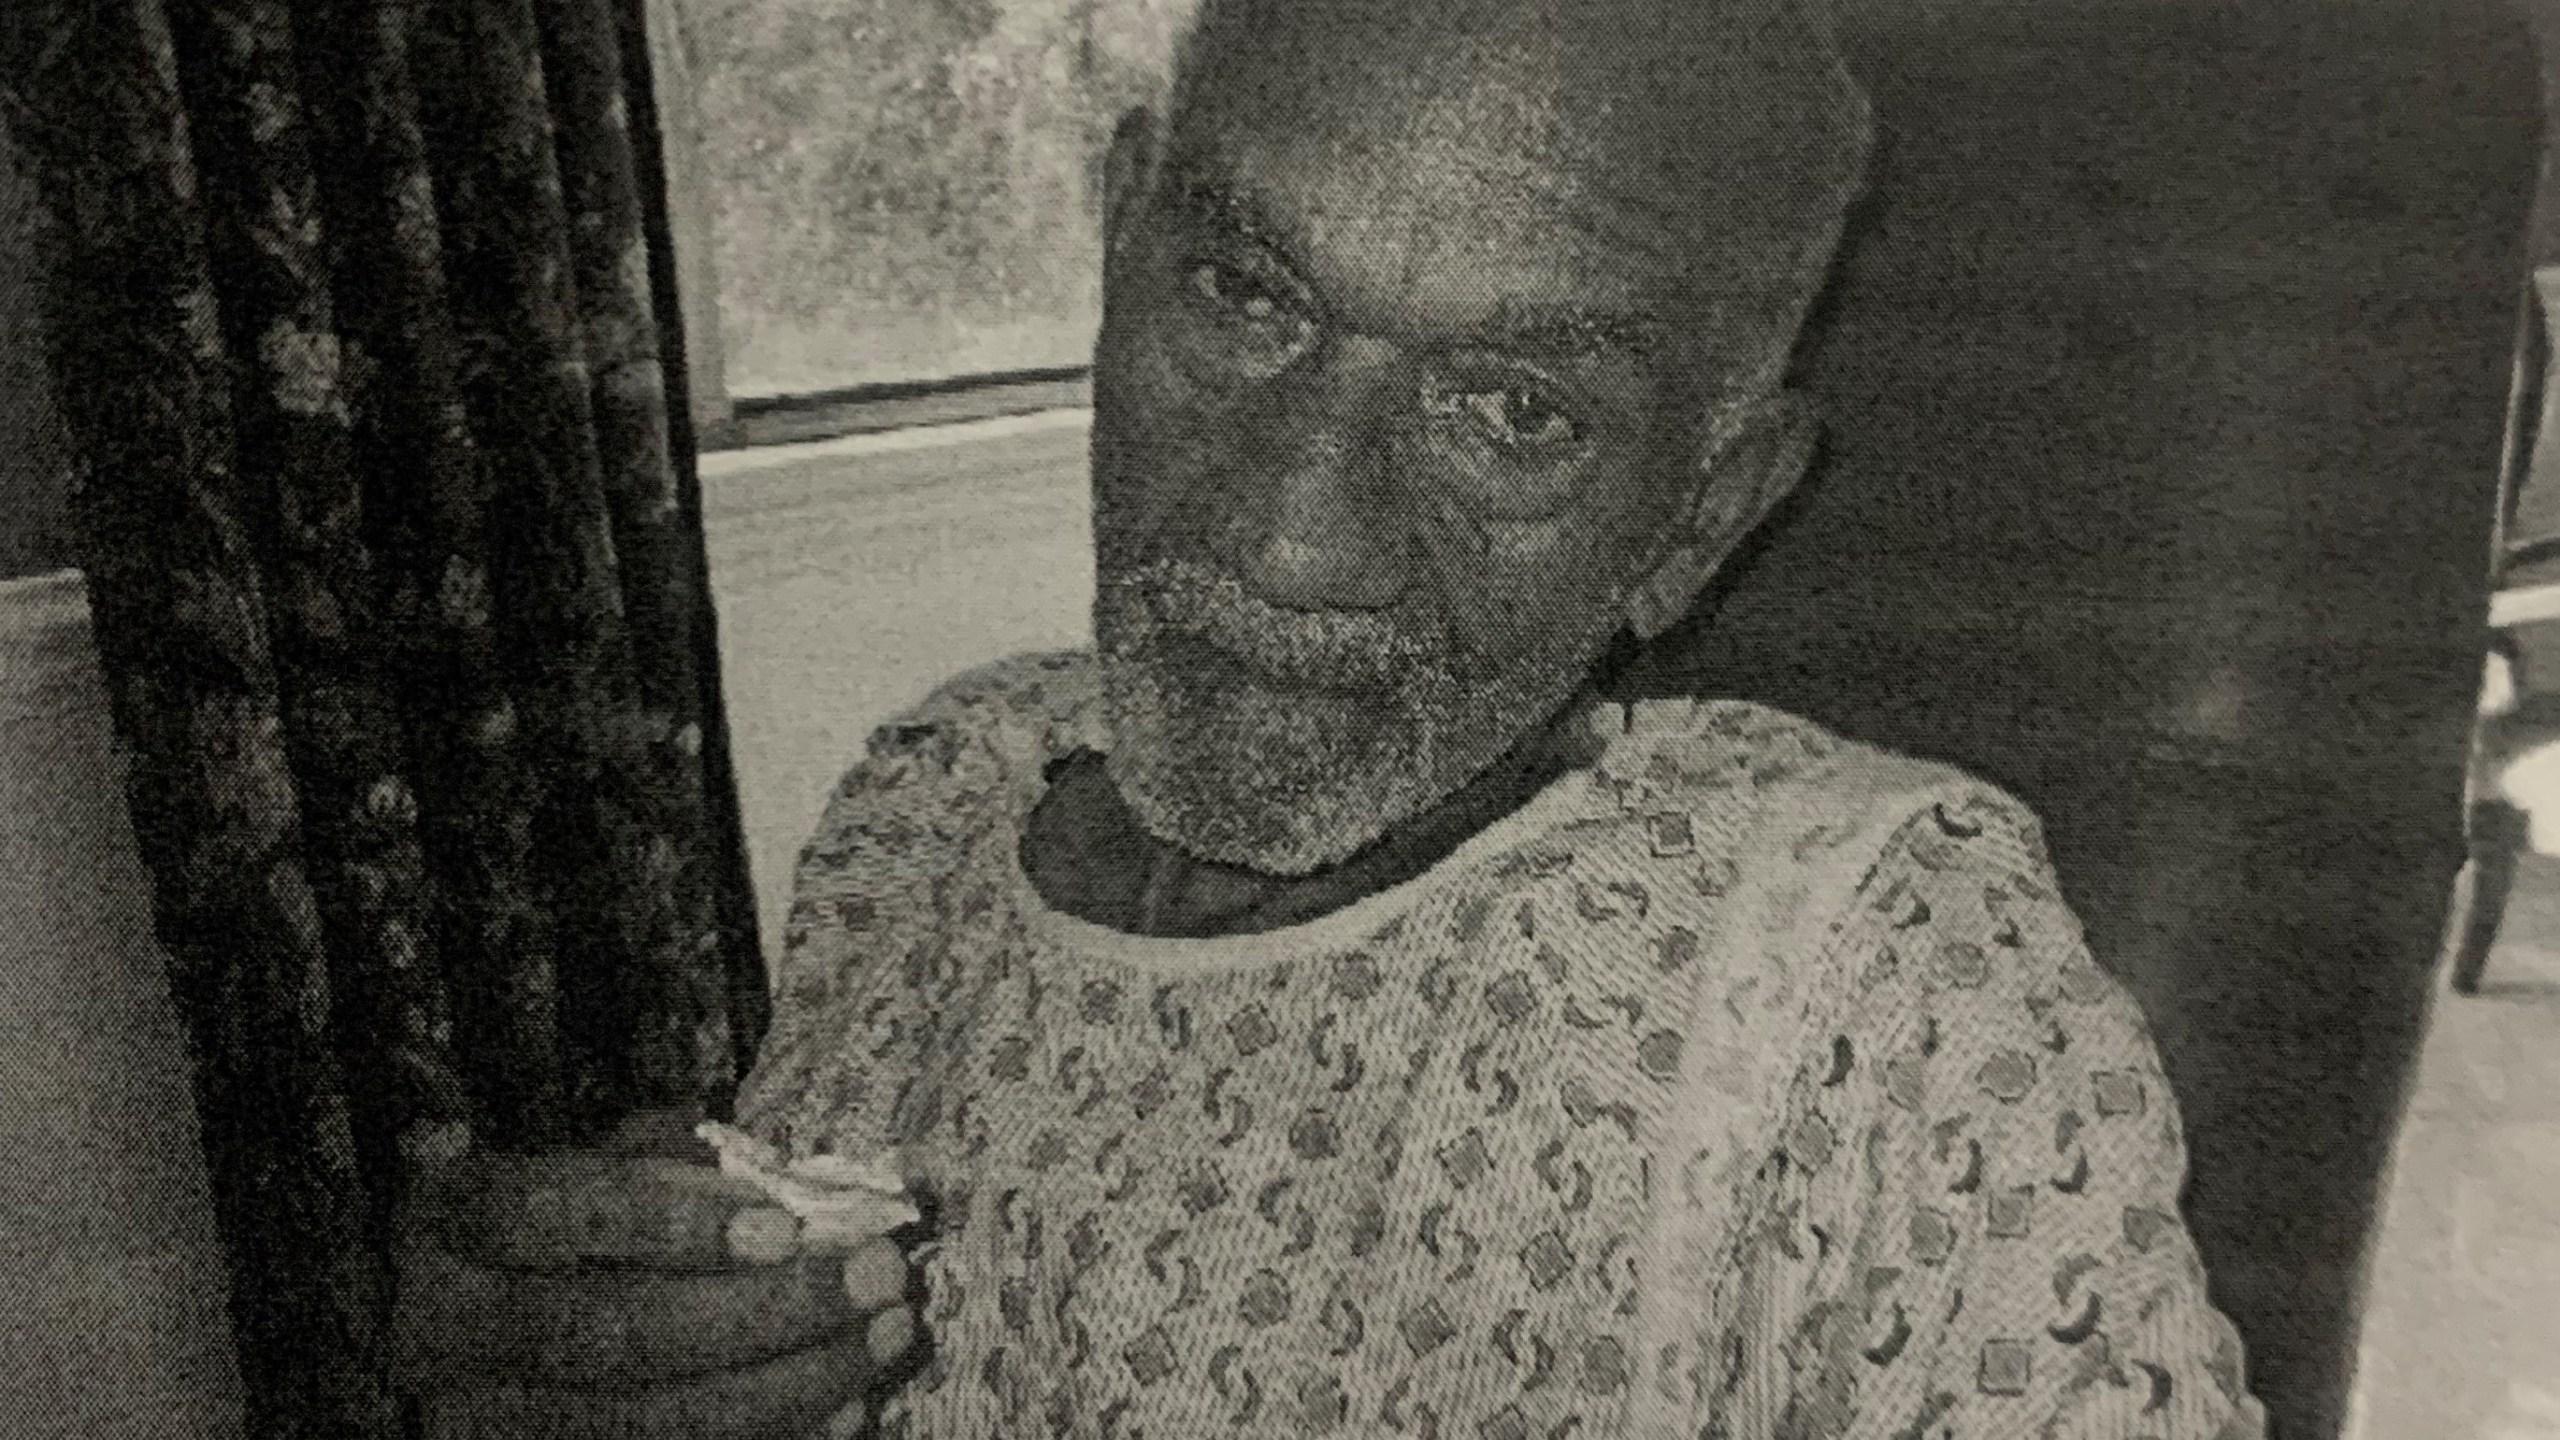 Missing Adult Phillip Edward Williams.9.16.21